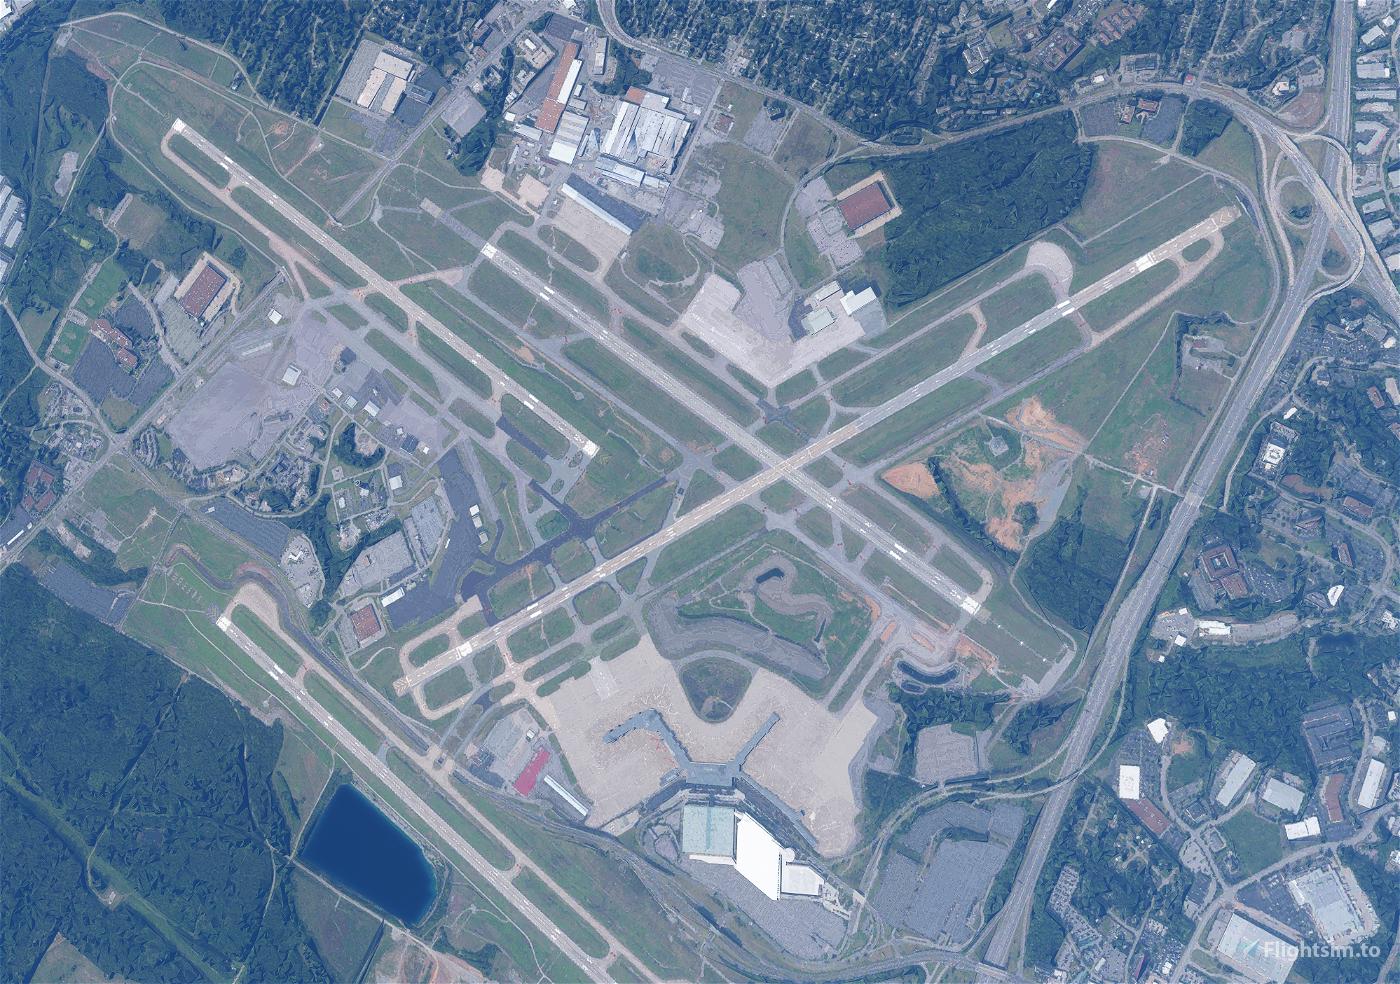 Runway and Taxiway glitch Fix for KBNA (Nashville International) Flight Simulator 2020